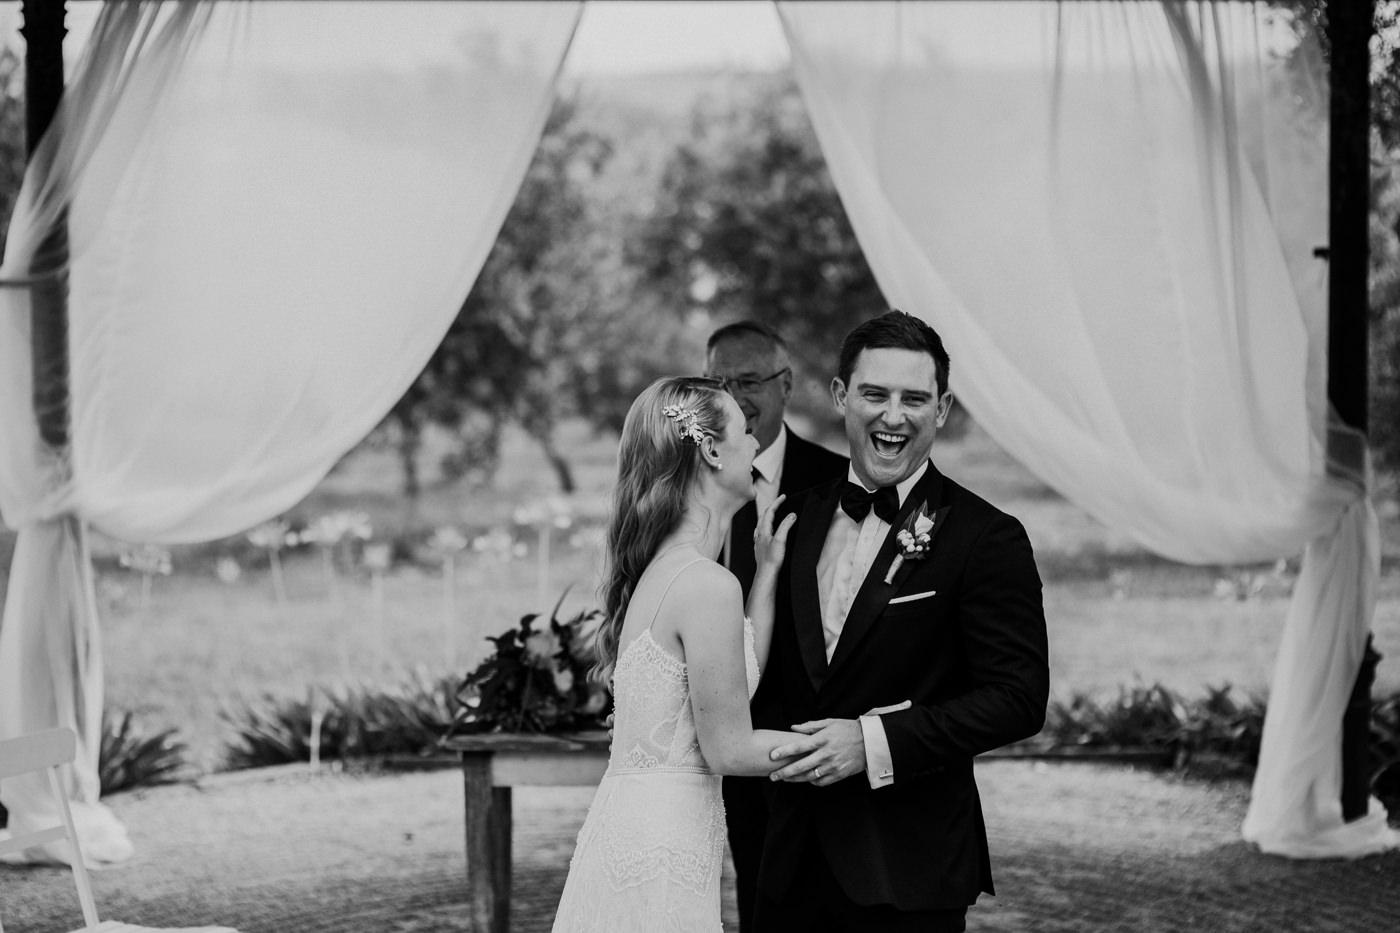 Anthony & Eliet - Wagga Wagga Wedding - Country NSW - Samantha Heather Photography-109.jpg